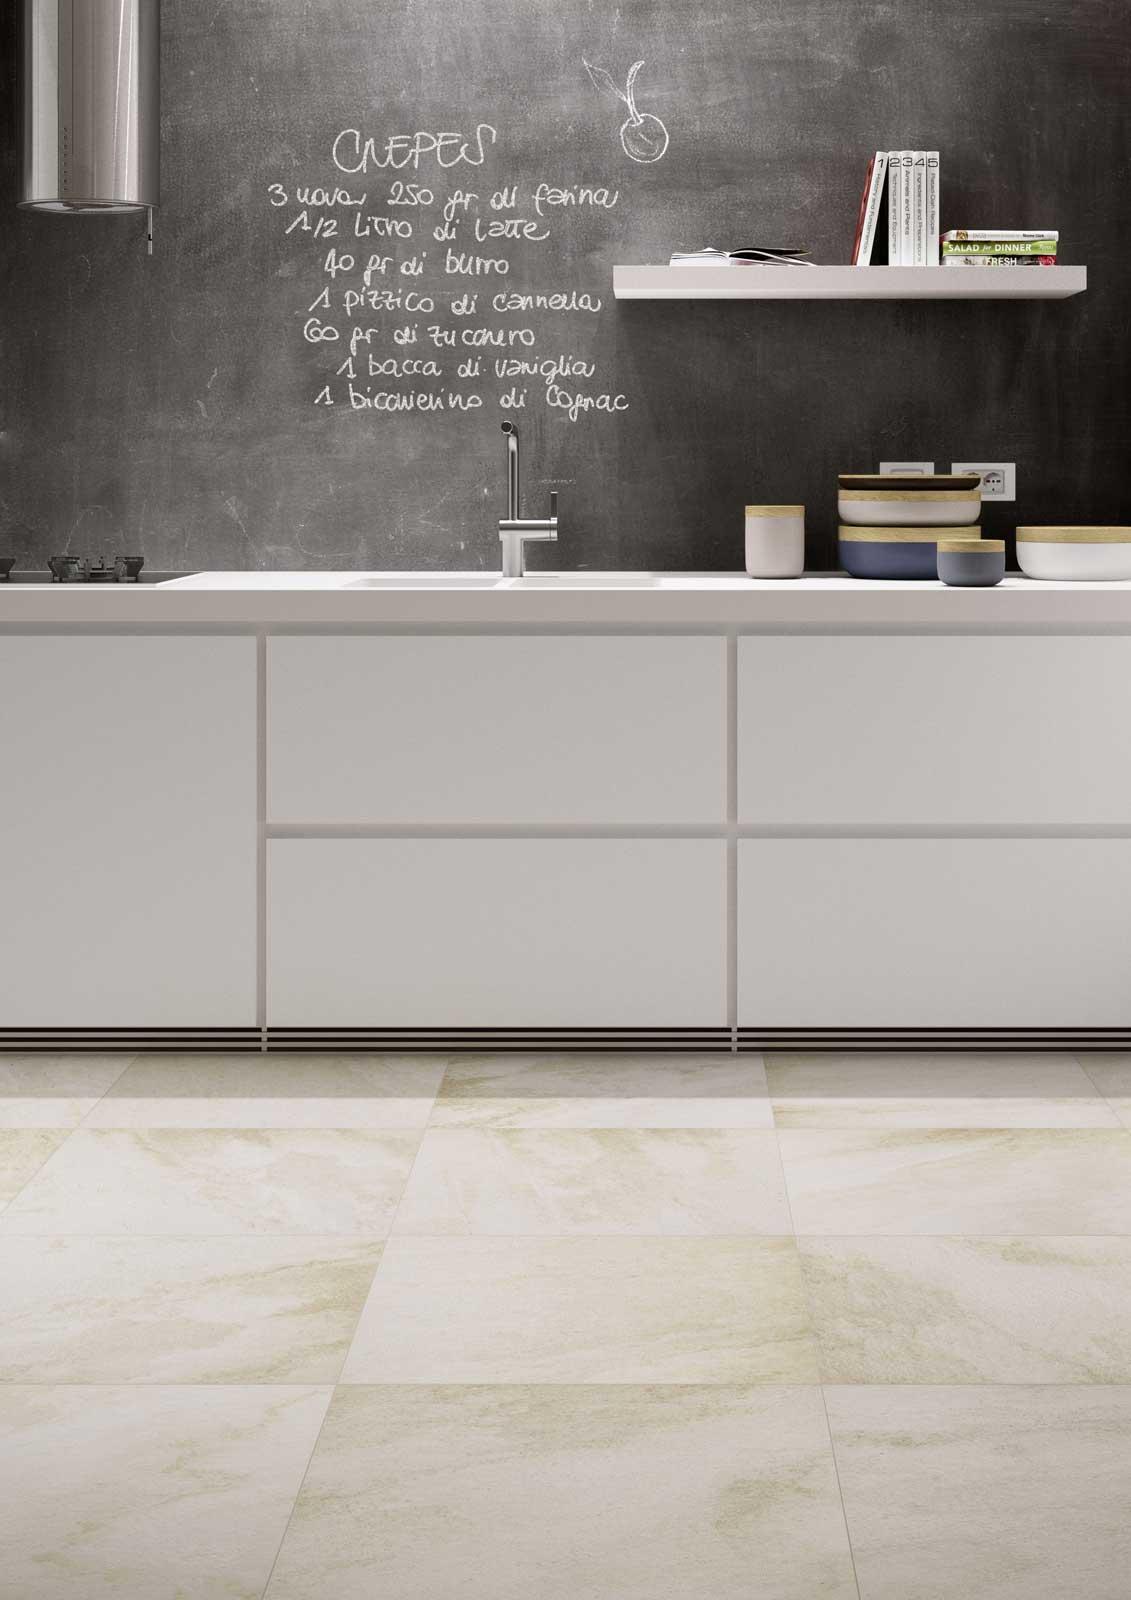 Ceramiche Da Cucina | Piastrelle Per Rivestimenti Cucina Bagno ...